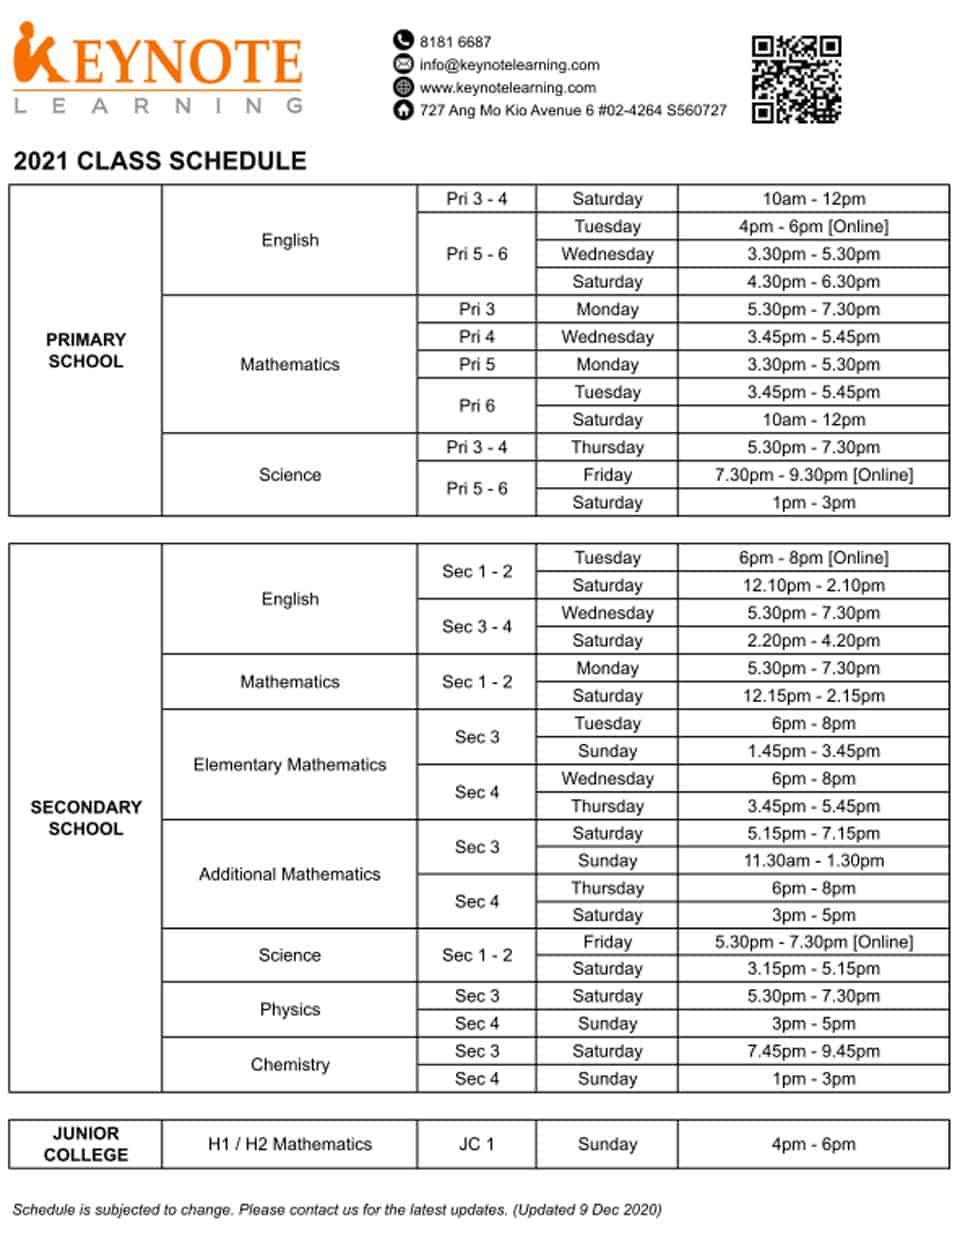 Keynote-2021-schedule-9dec20